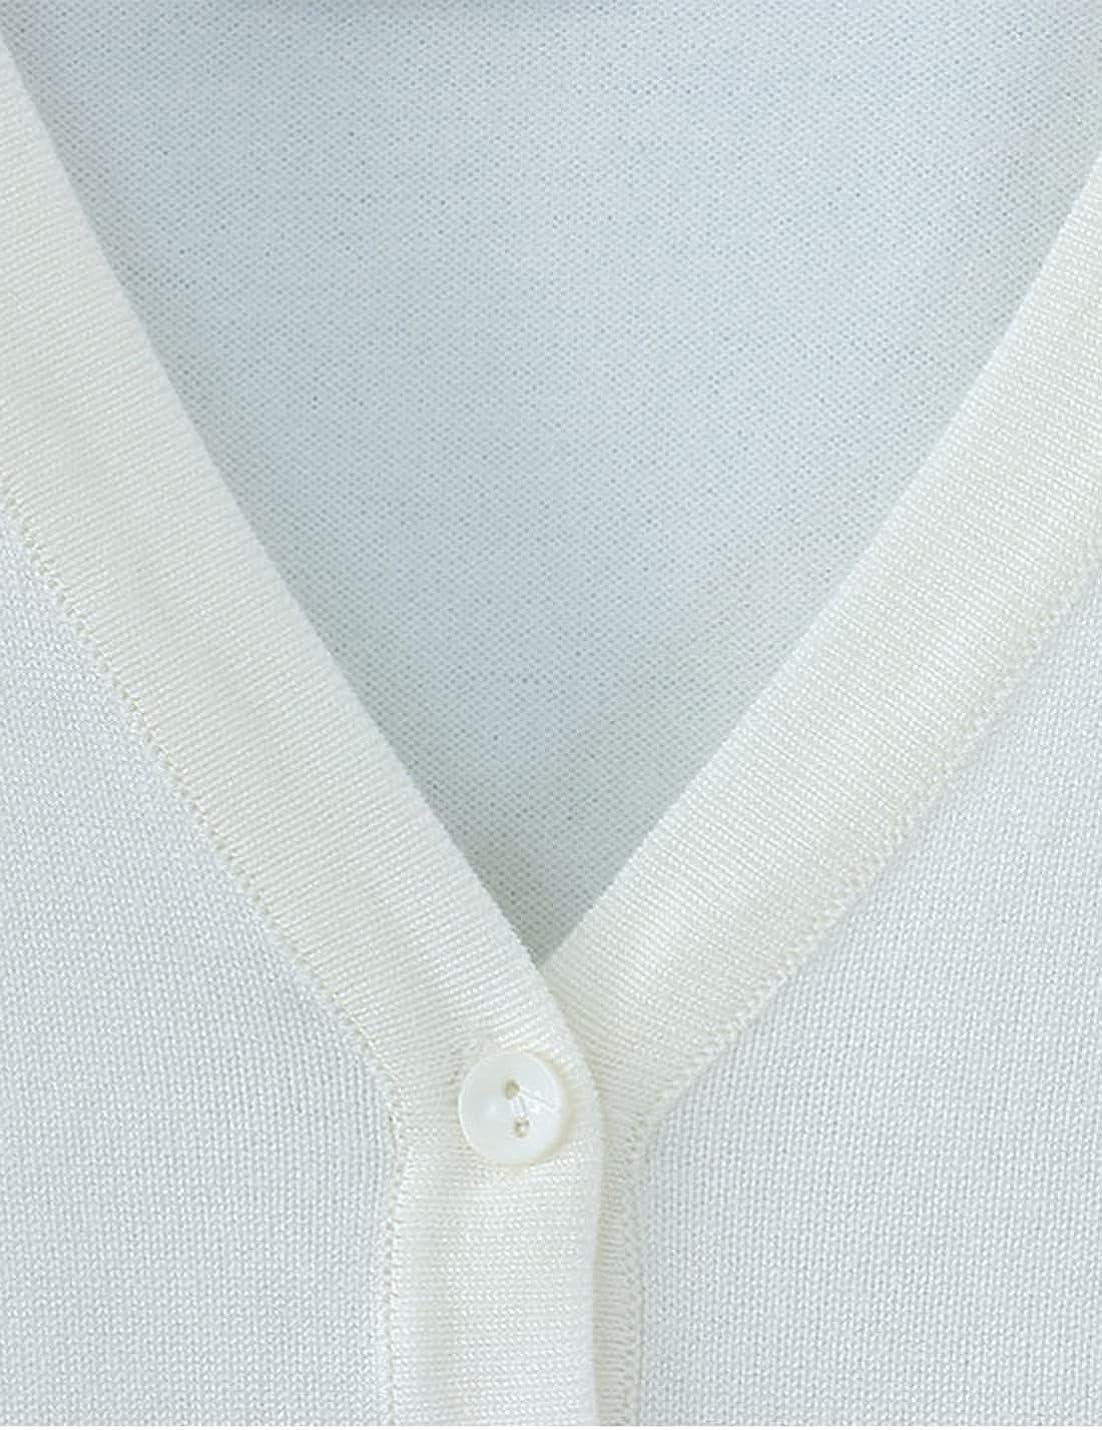 SeekMe Women's Lightweight Knit Cardigan Sweater Short Button Down Knitwear Top